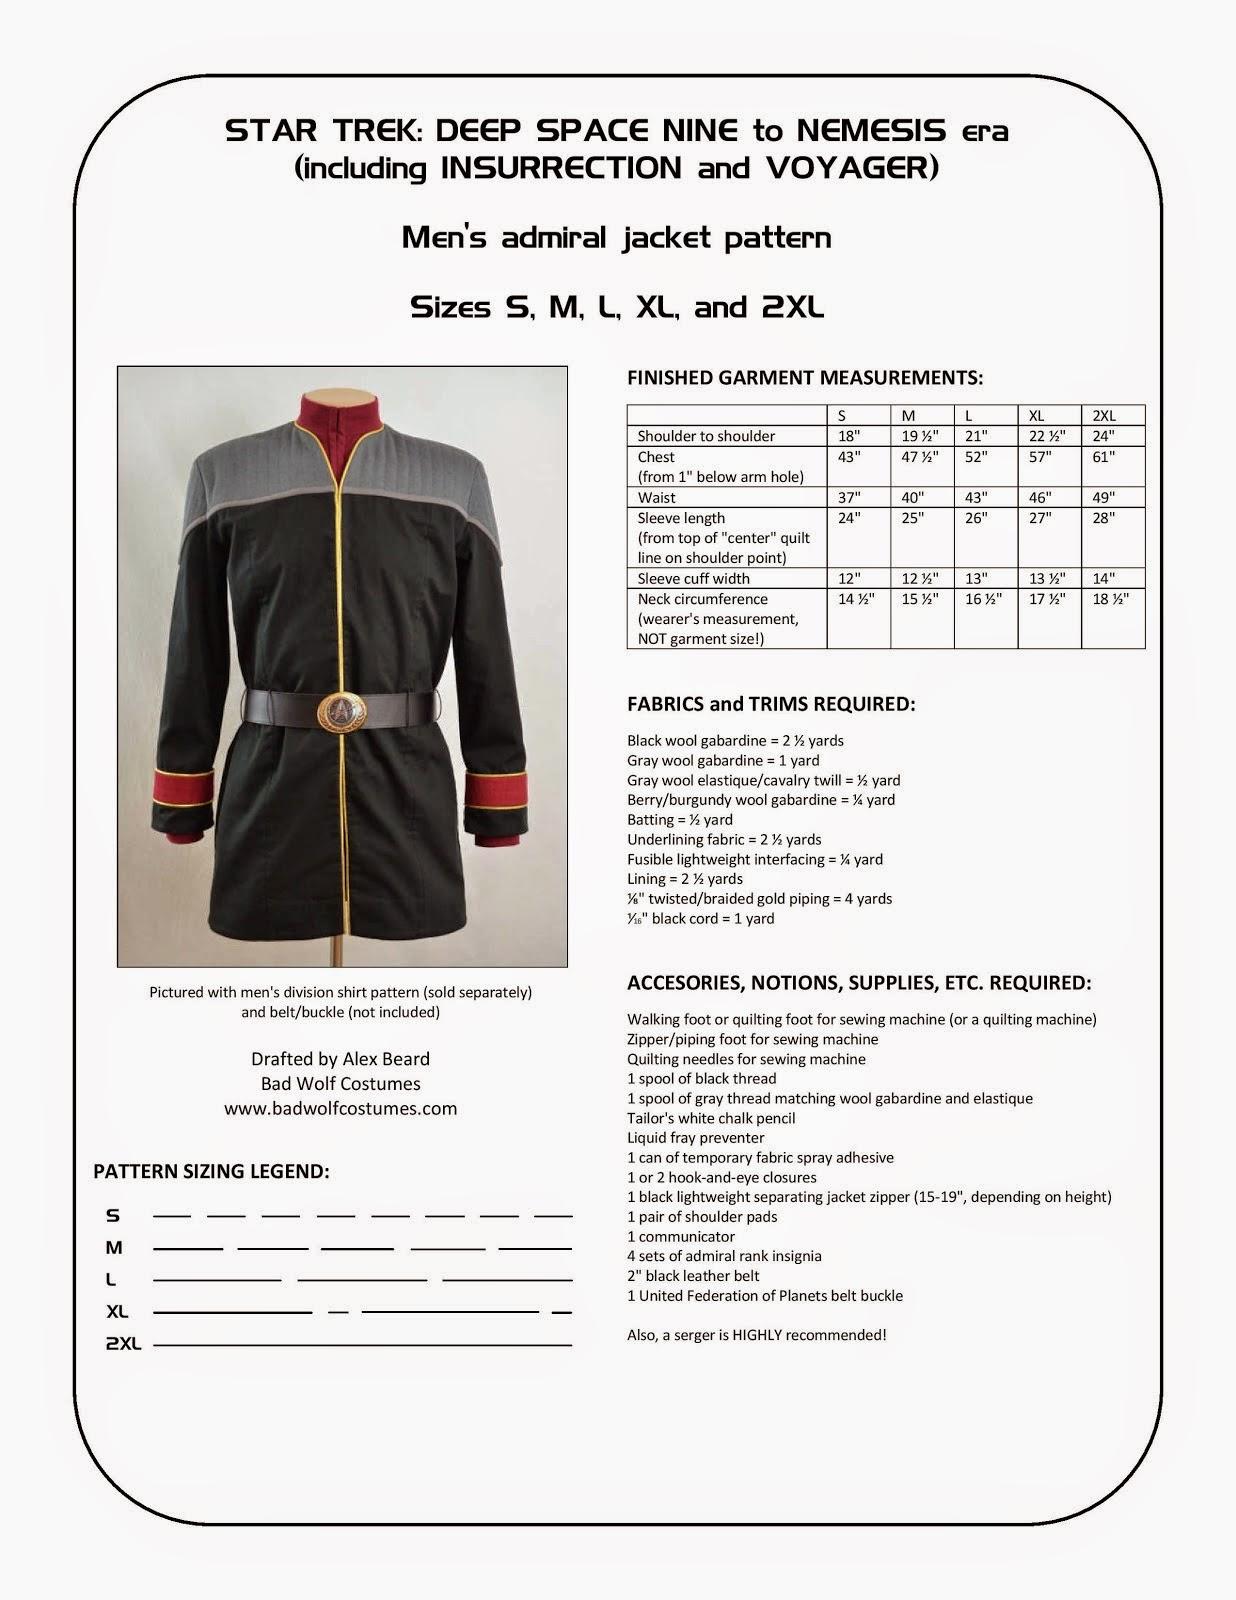 Star Trek: DS9/NEM Men's Admiral Jacket Sewing Pattern